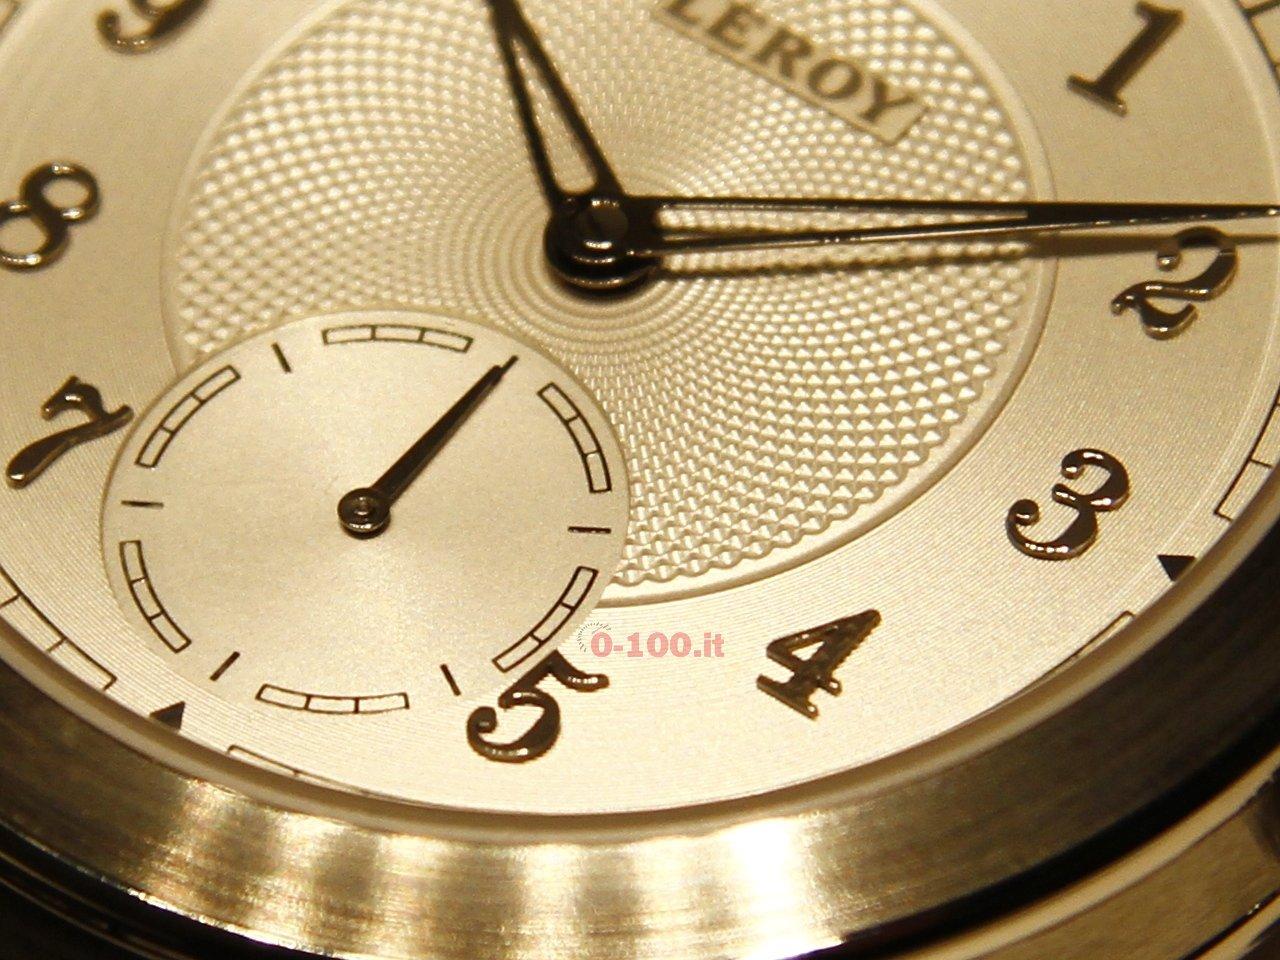 baselworld-2015_leroy-chronometer-l200-0-100-8